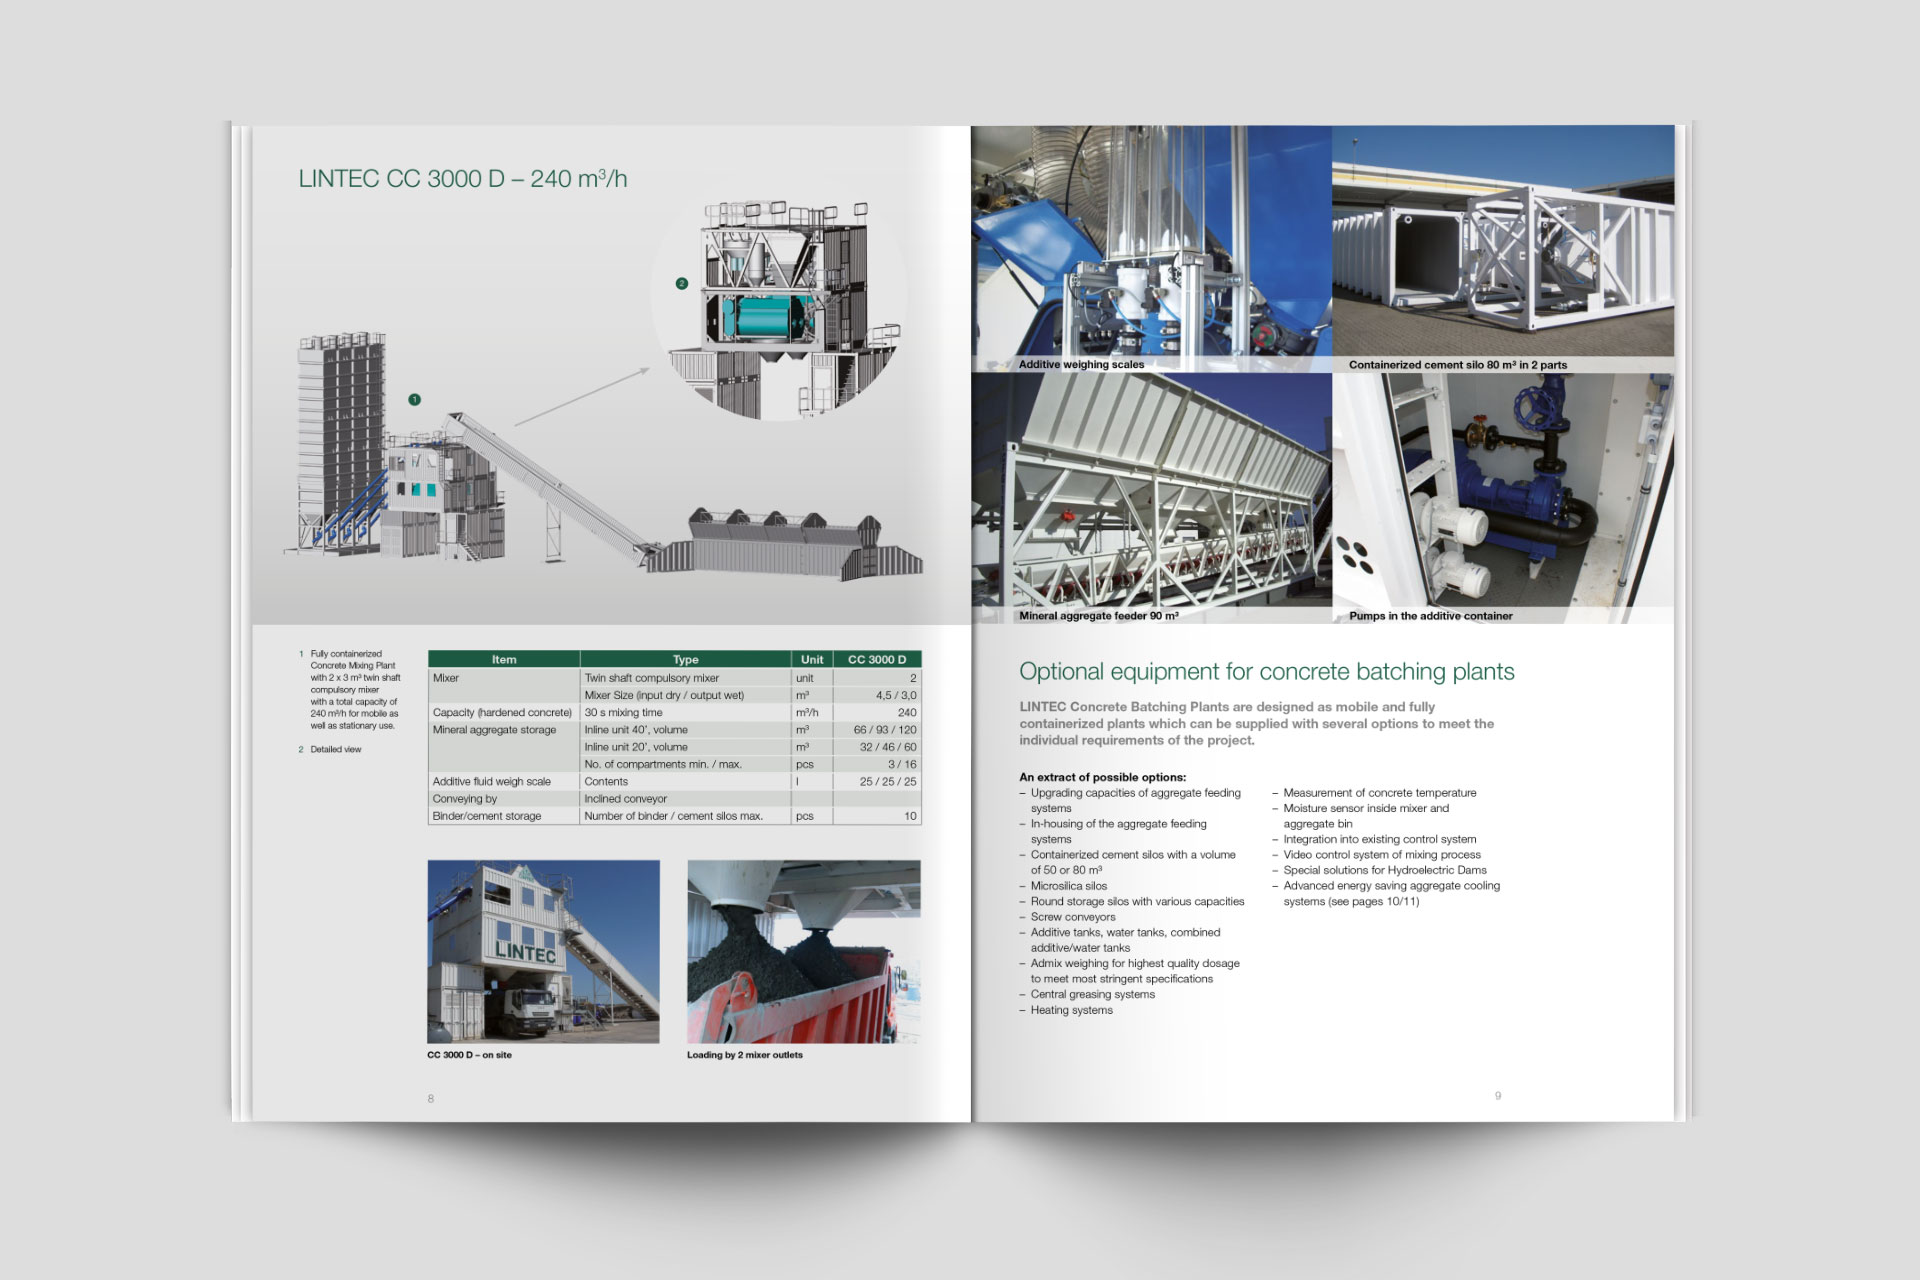 Lintec Group Broschürendesign im Corporate Design